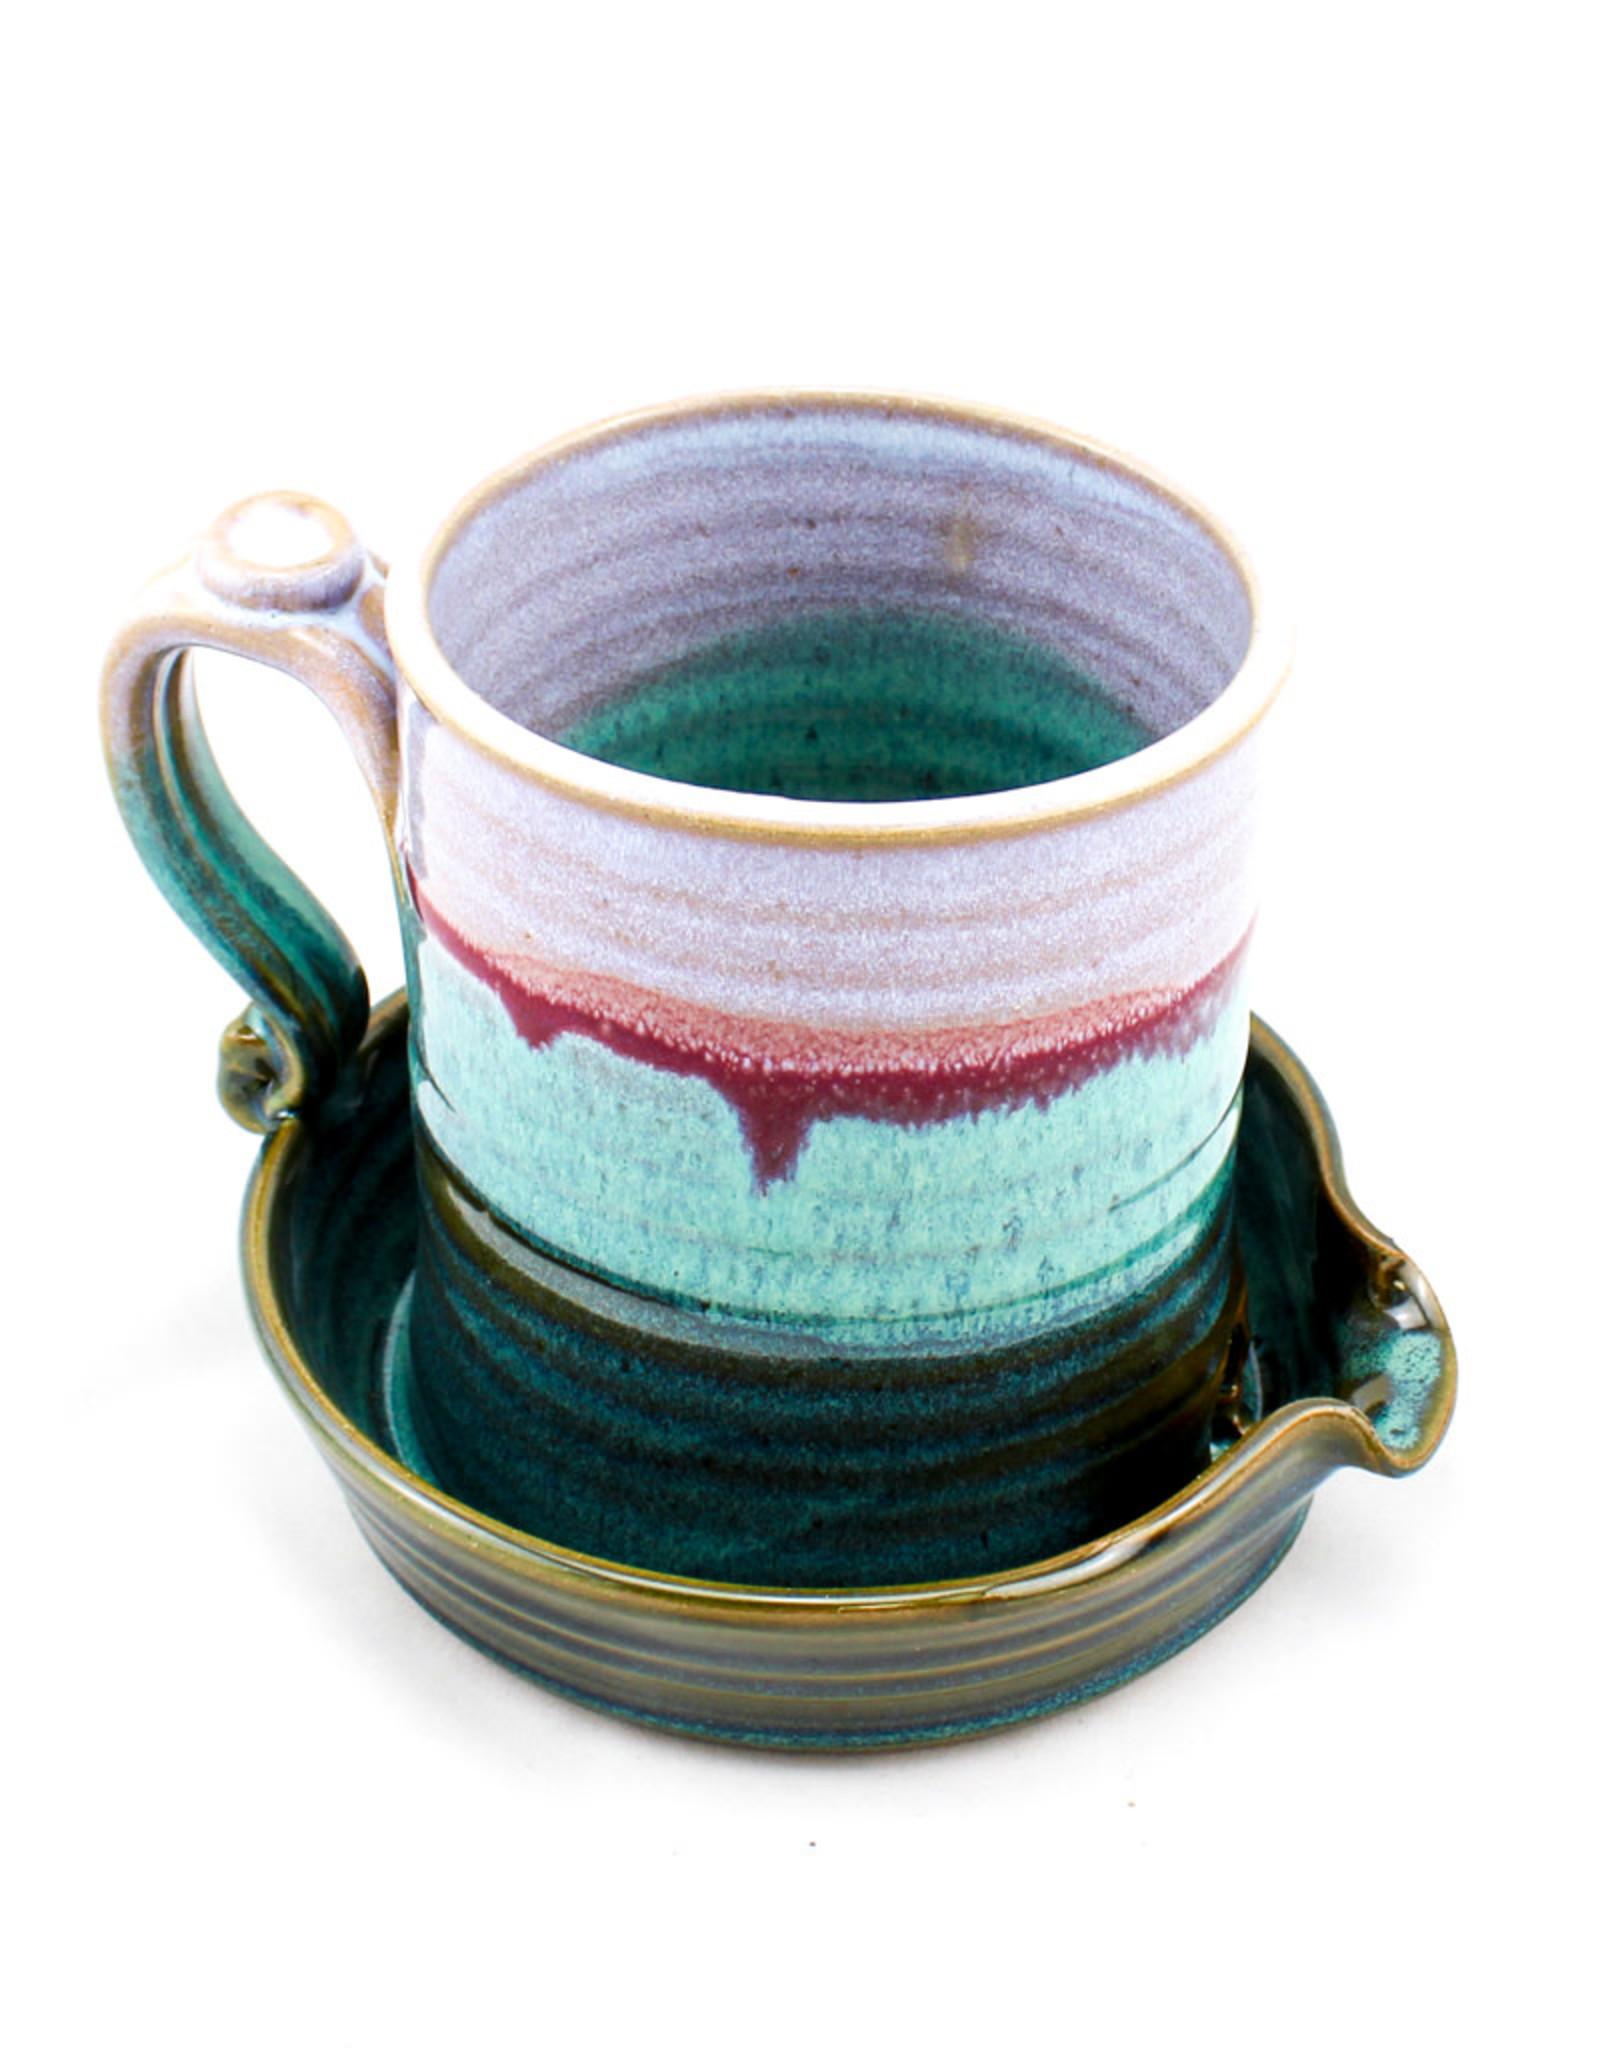 Salvaterra Pottery Bacon Cooker